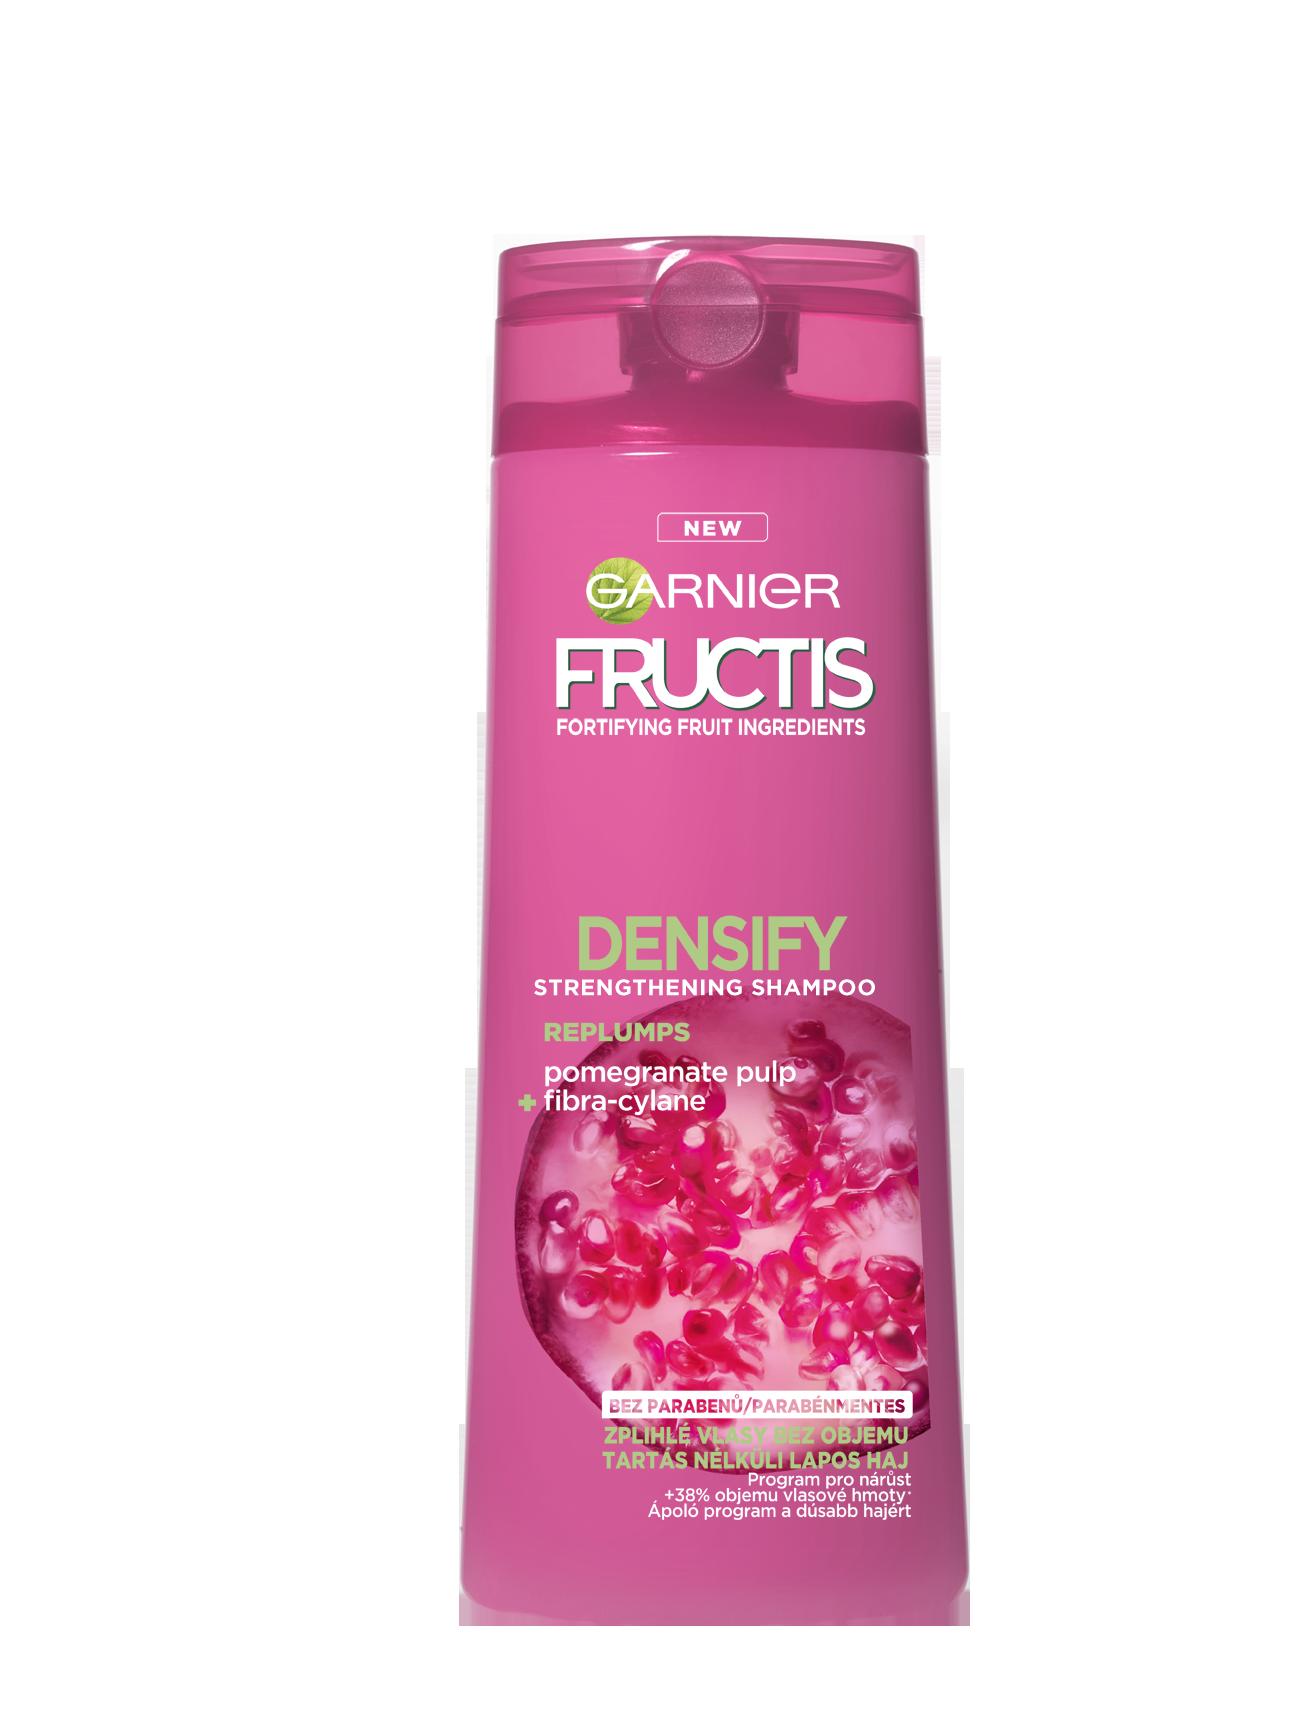 Garnier Fructis Densify posilující šampon 250 ml